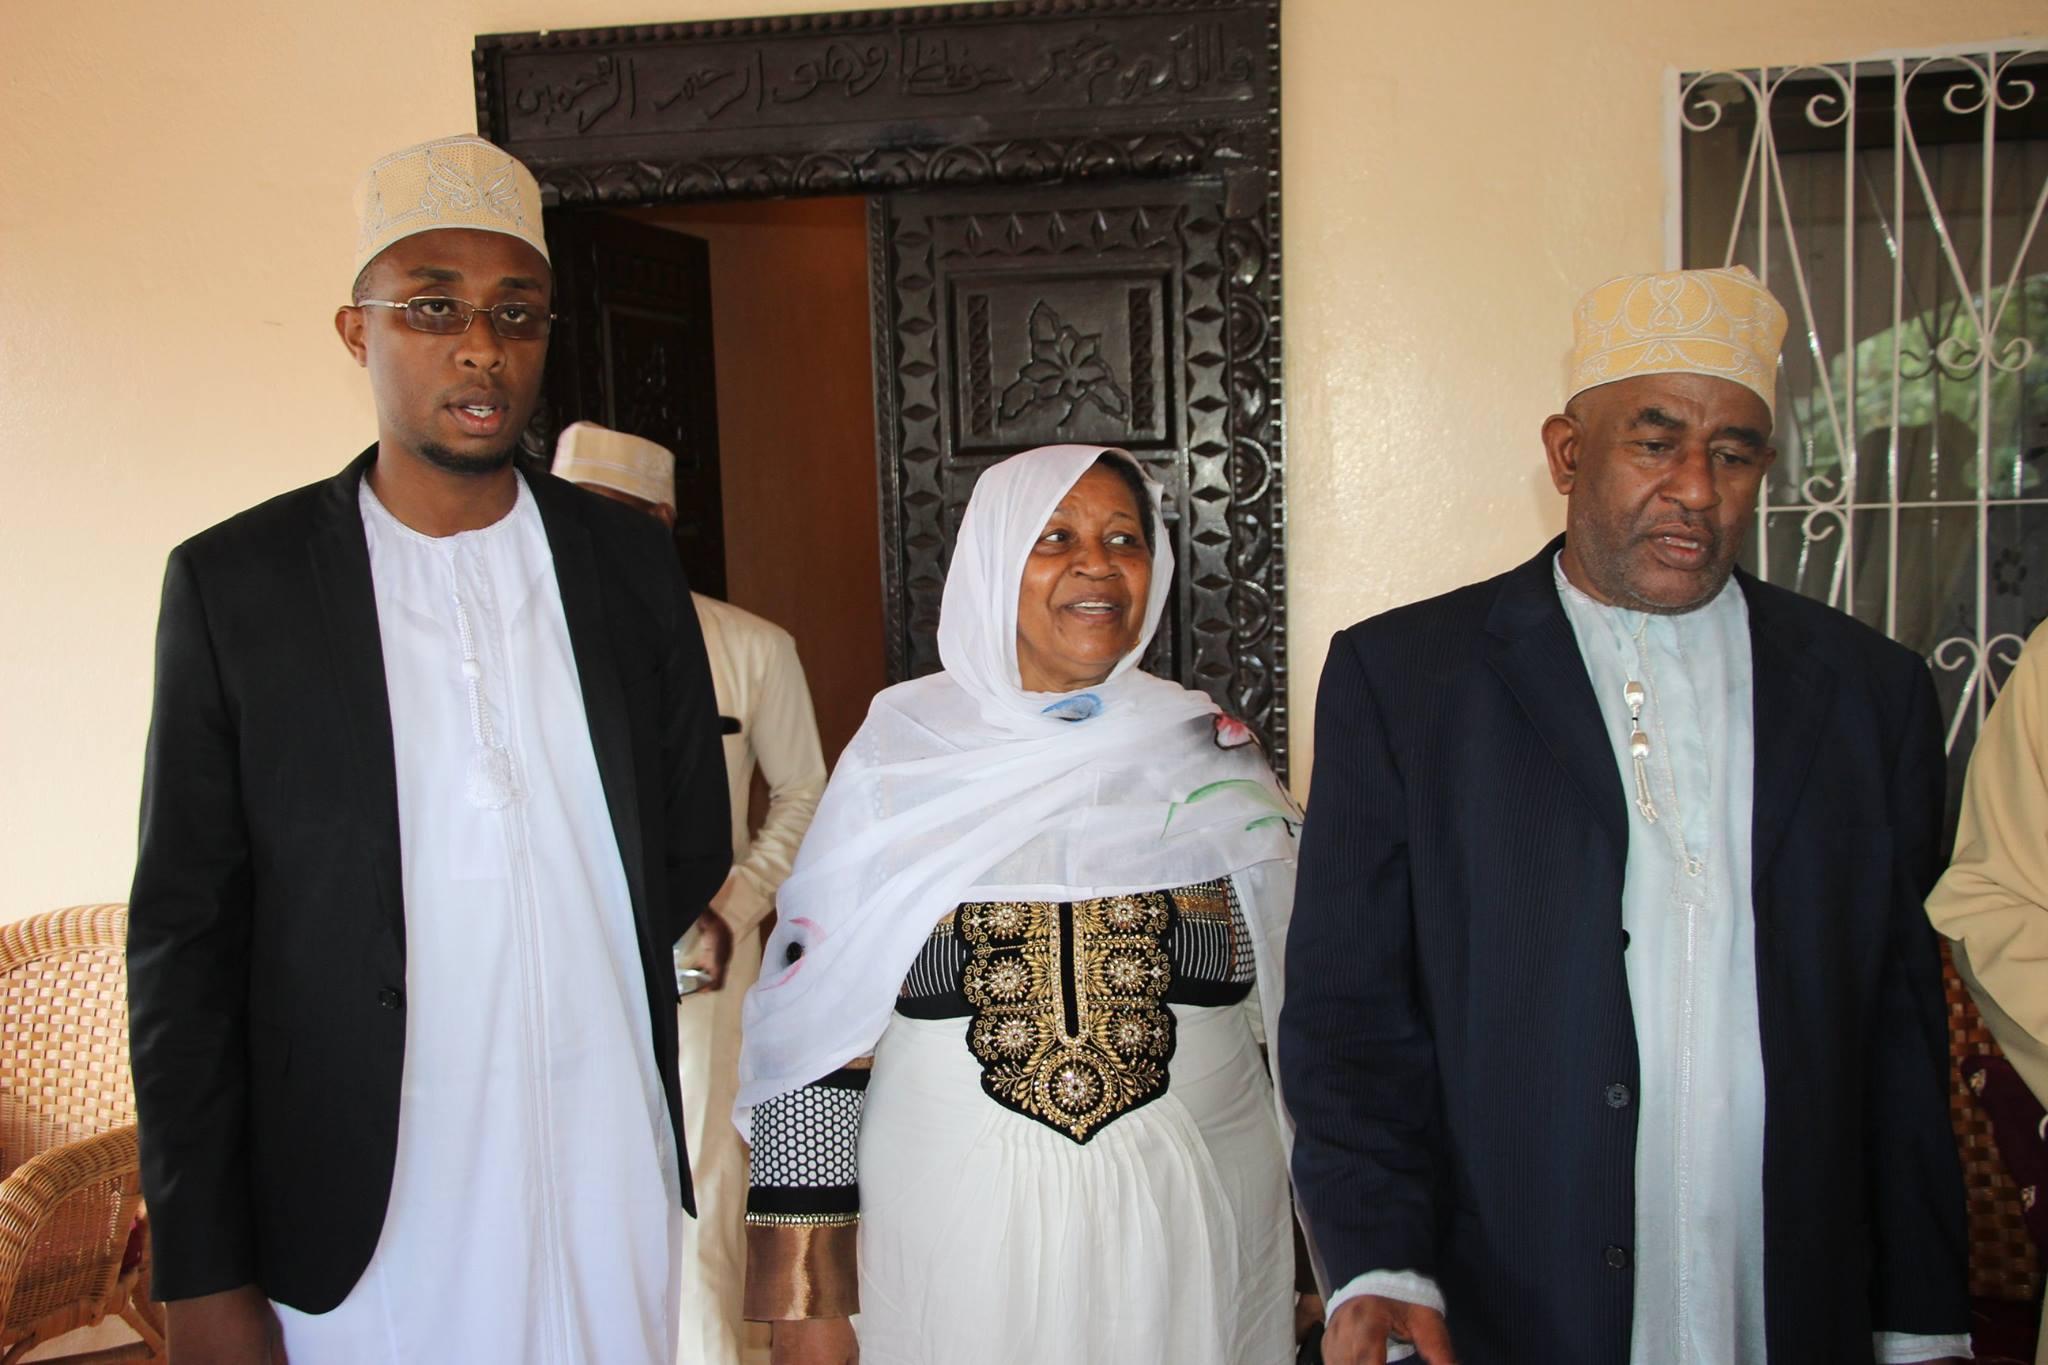 Loukman menace Papa Azali Assoumani sur sa bigamie